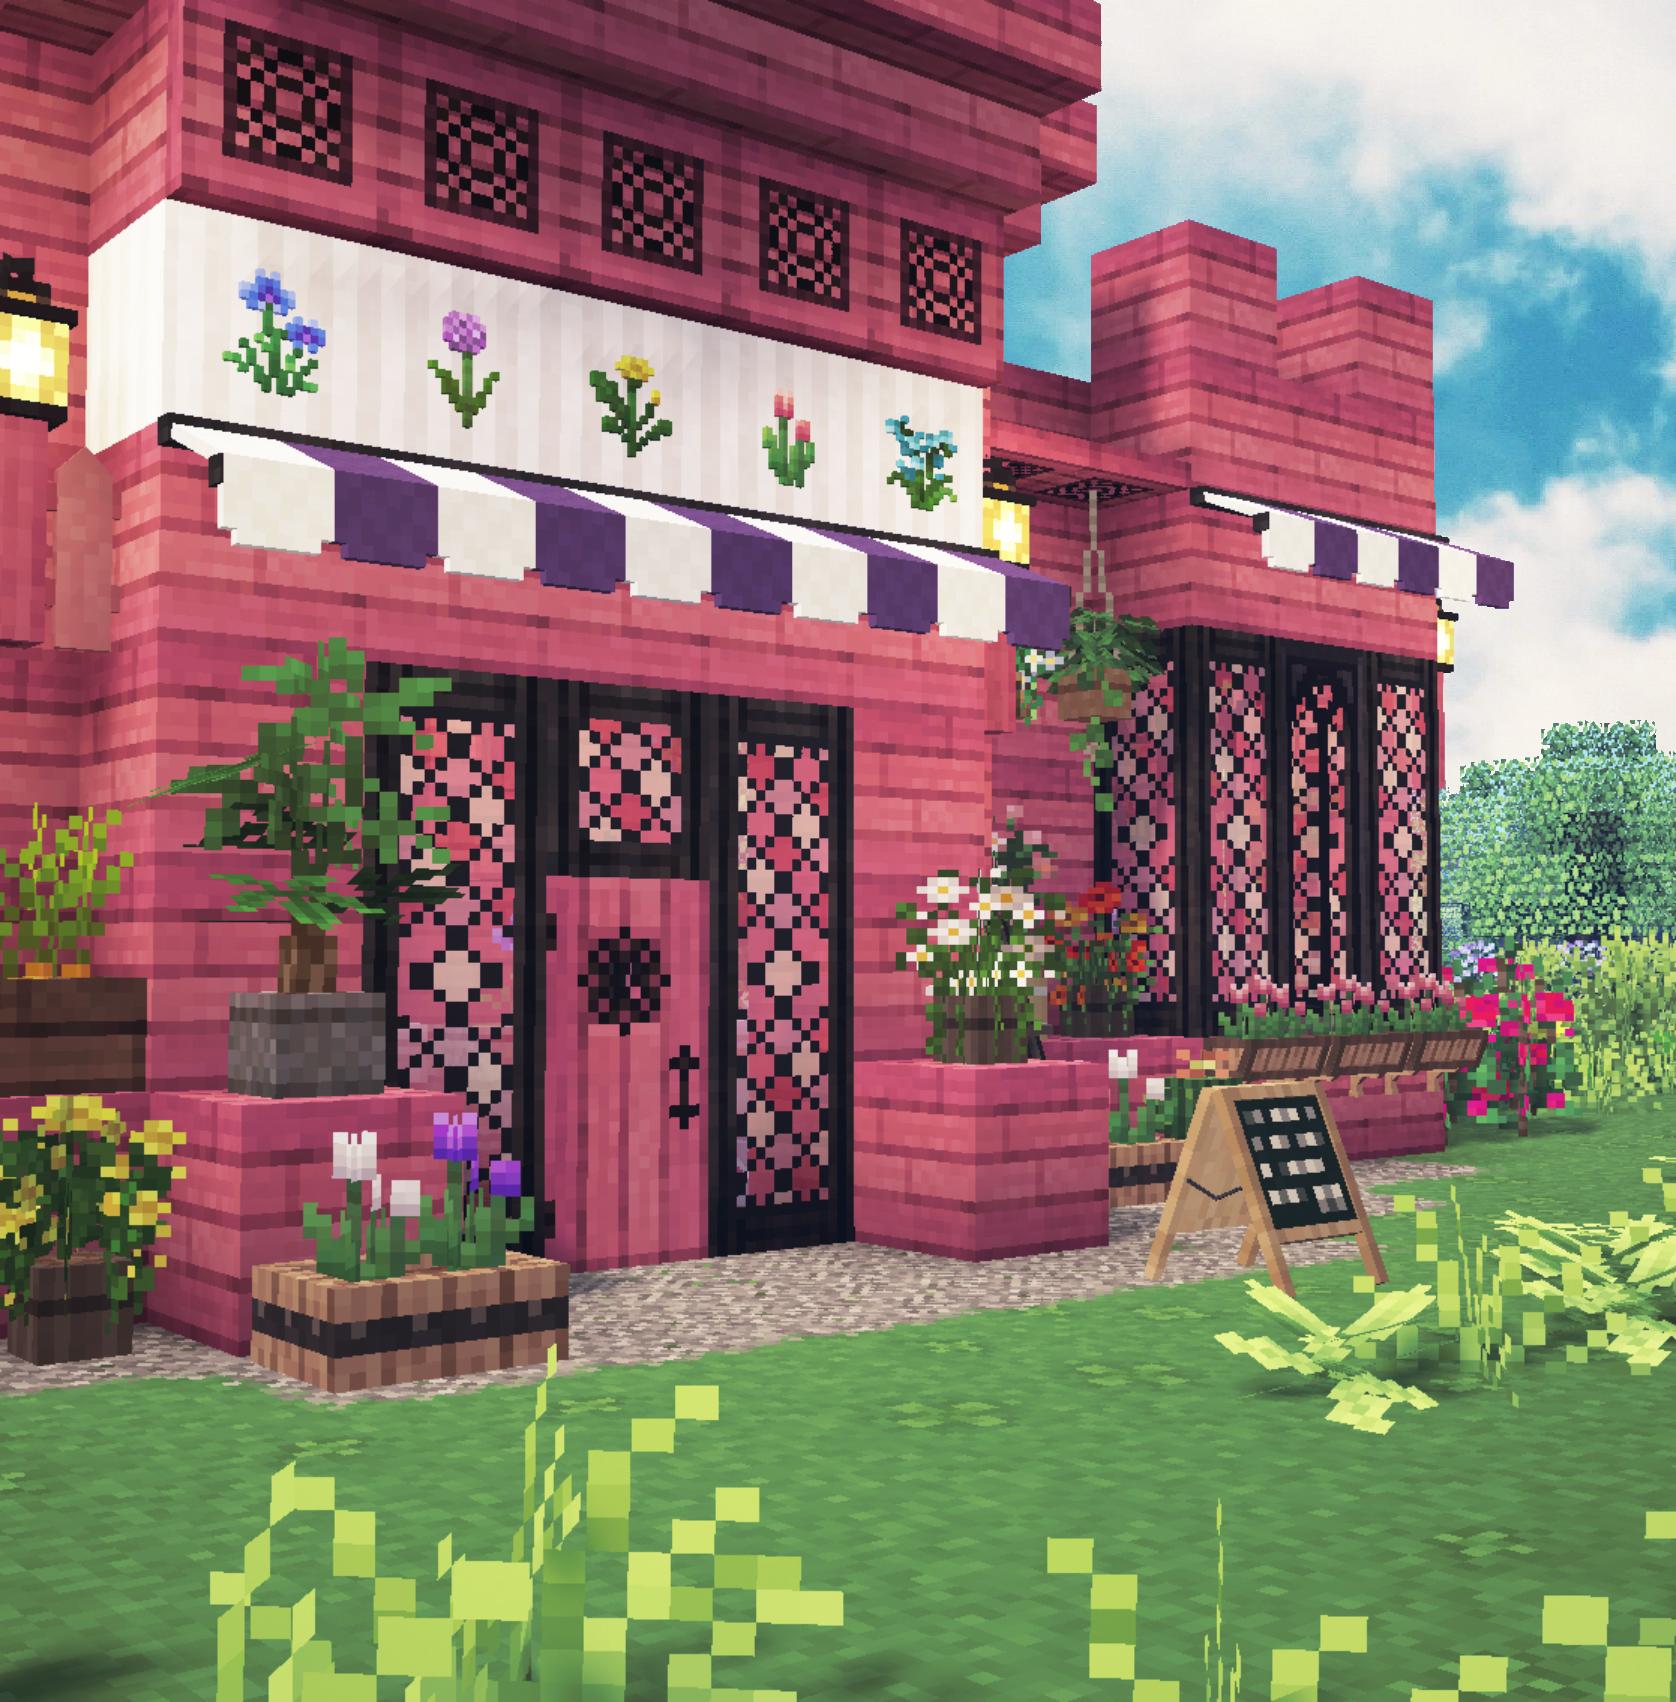 Aesthetic Minecraft Flower Shop 🌸🌿✨ Fairytale Cottagecore 🌷 by Kelpie The Fox